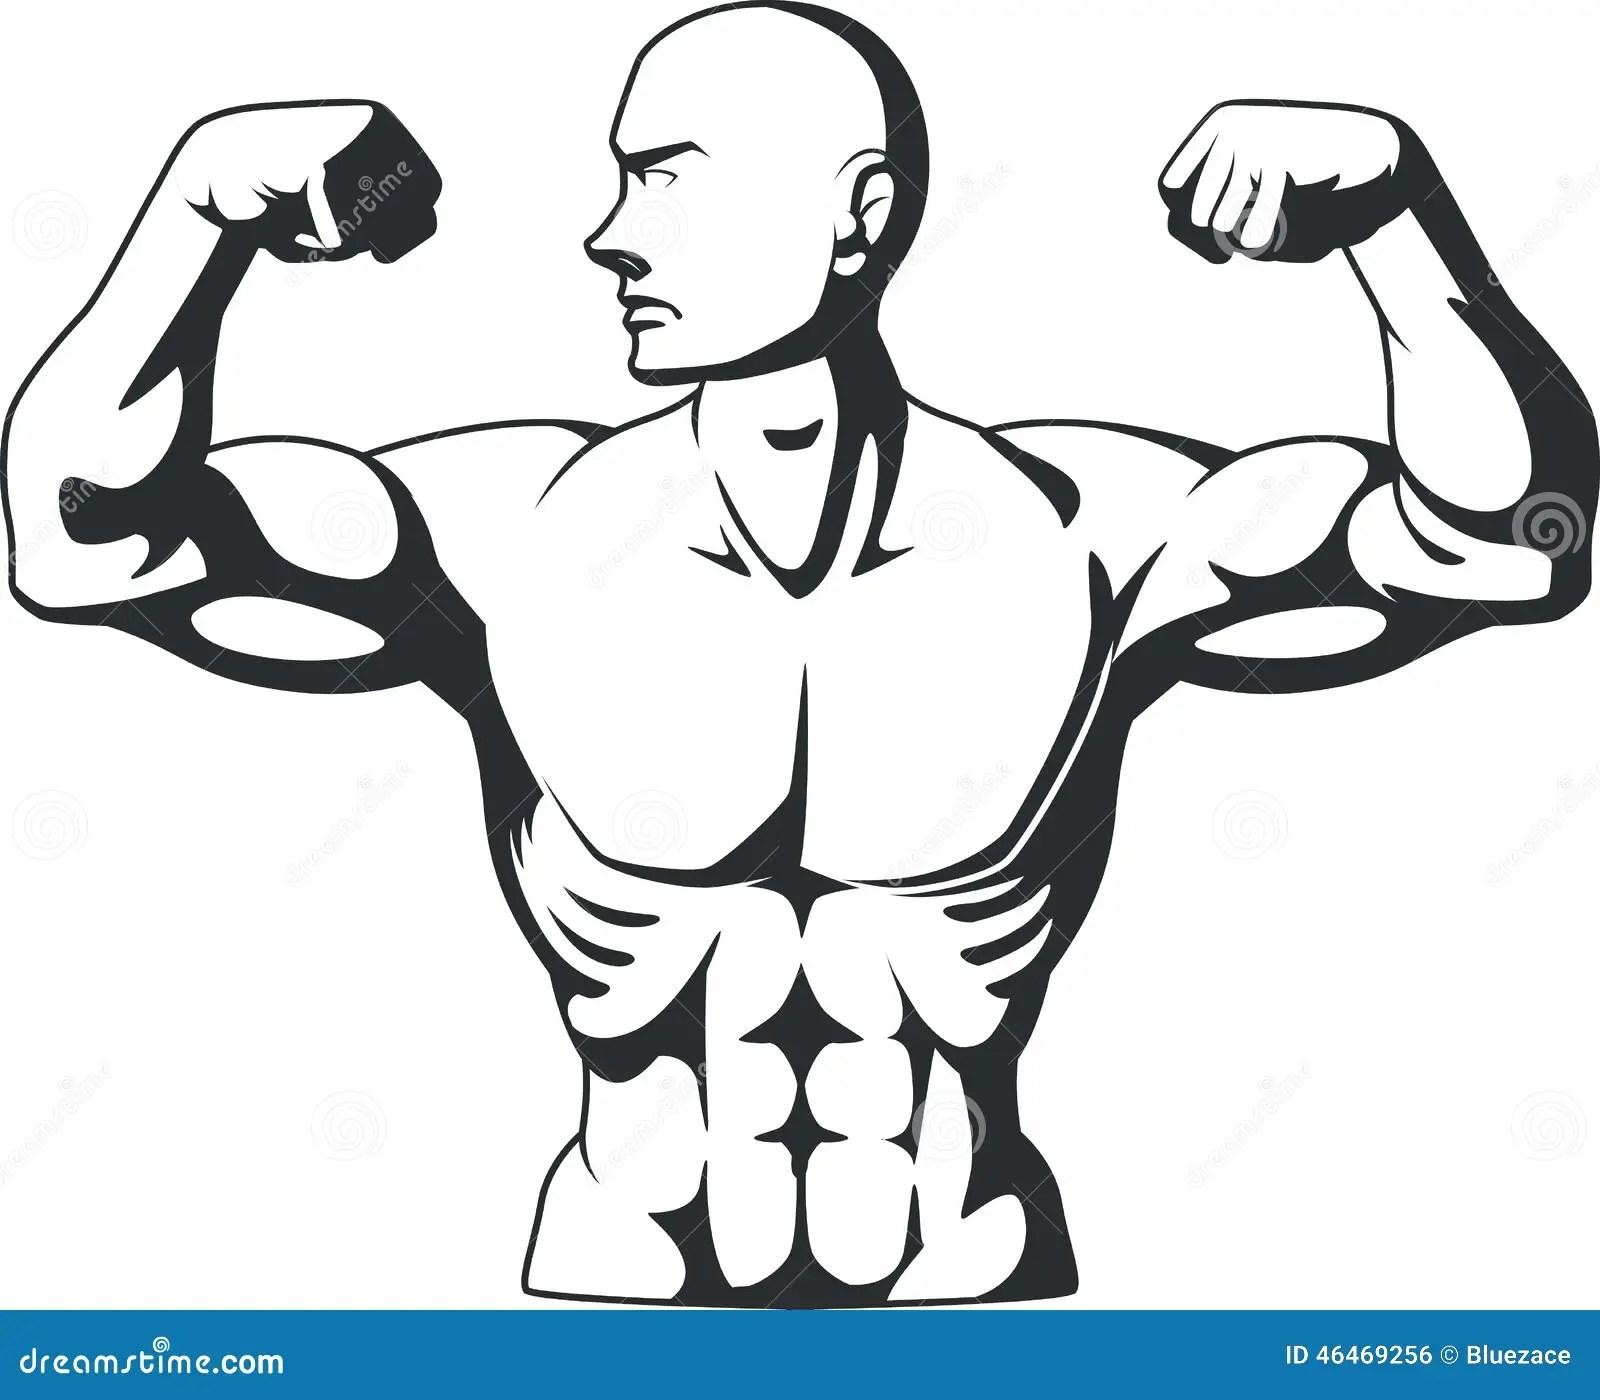 Silhouette Of Bodybuilder Flexing Muscles Stock Vector